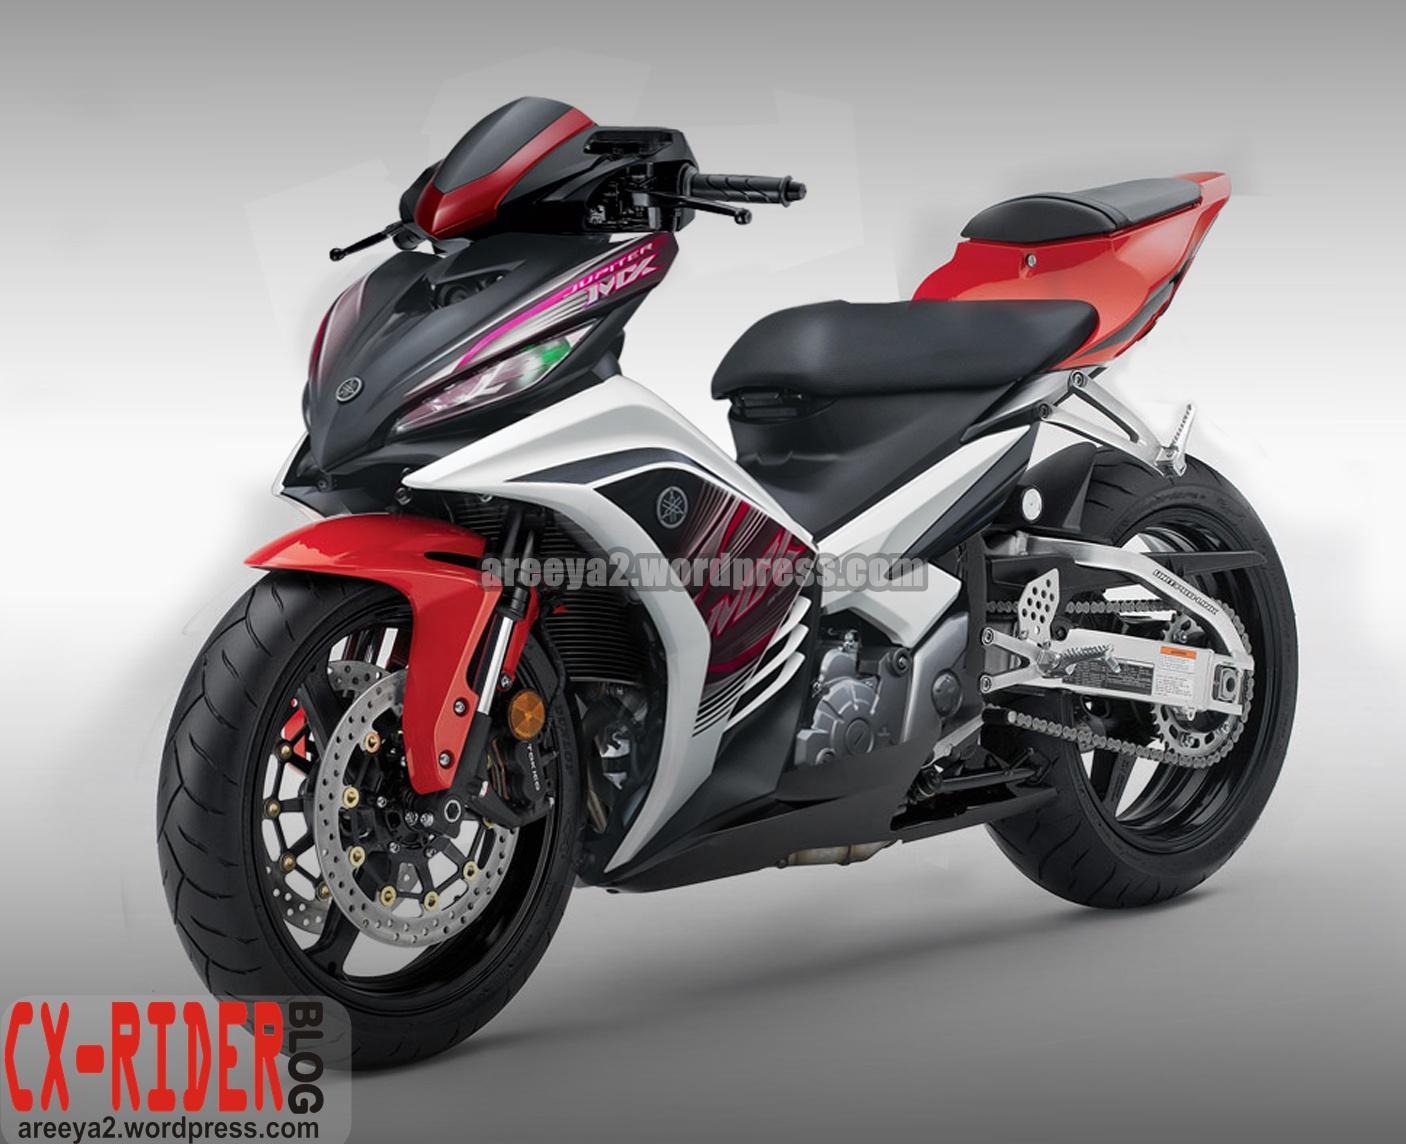 Foto Motor Jupiter Mx Di Modif Modifikasi Motor Yamaha